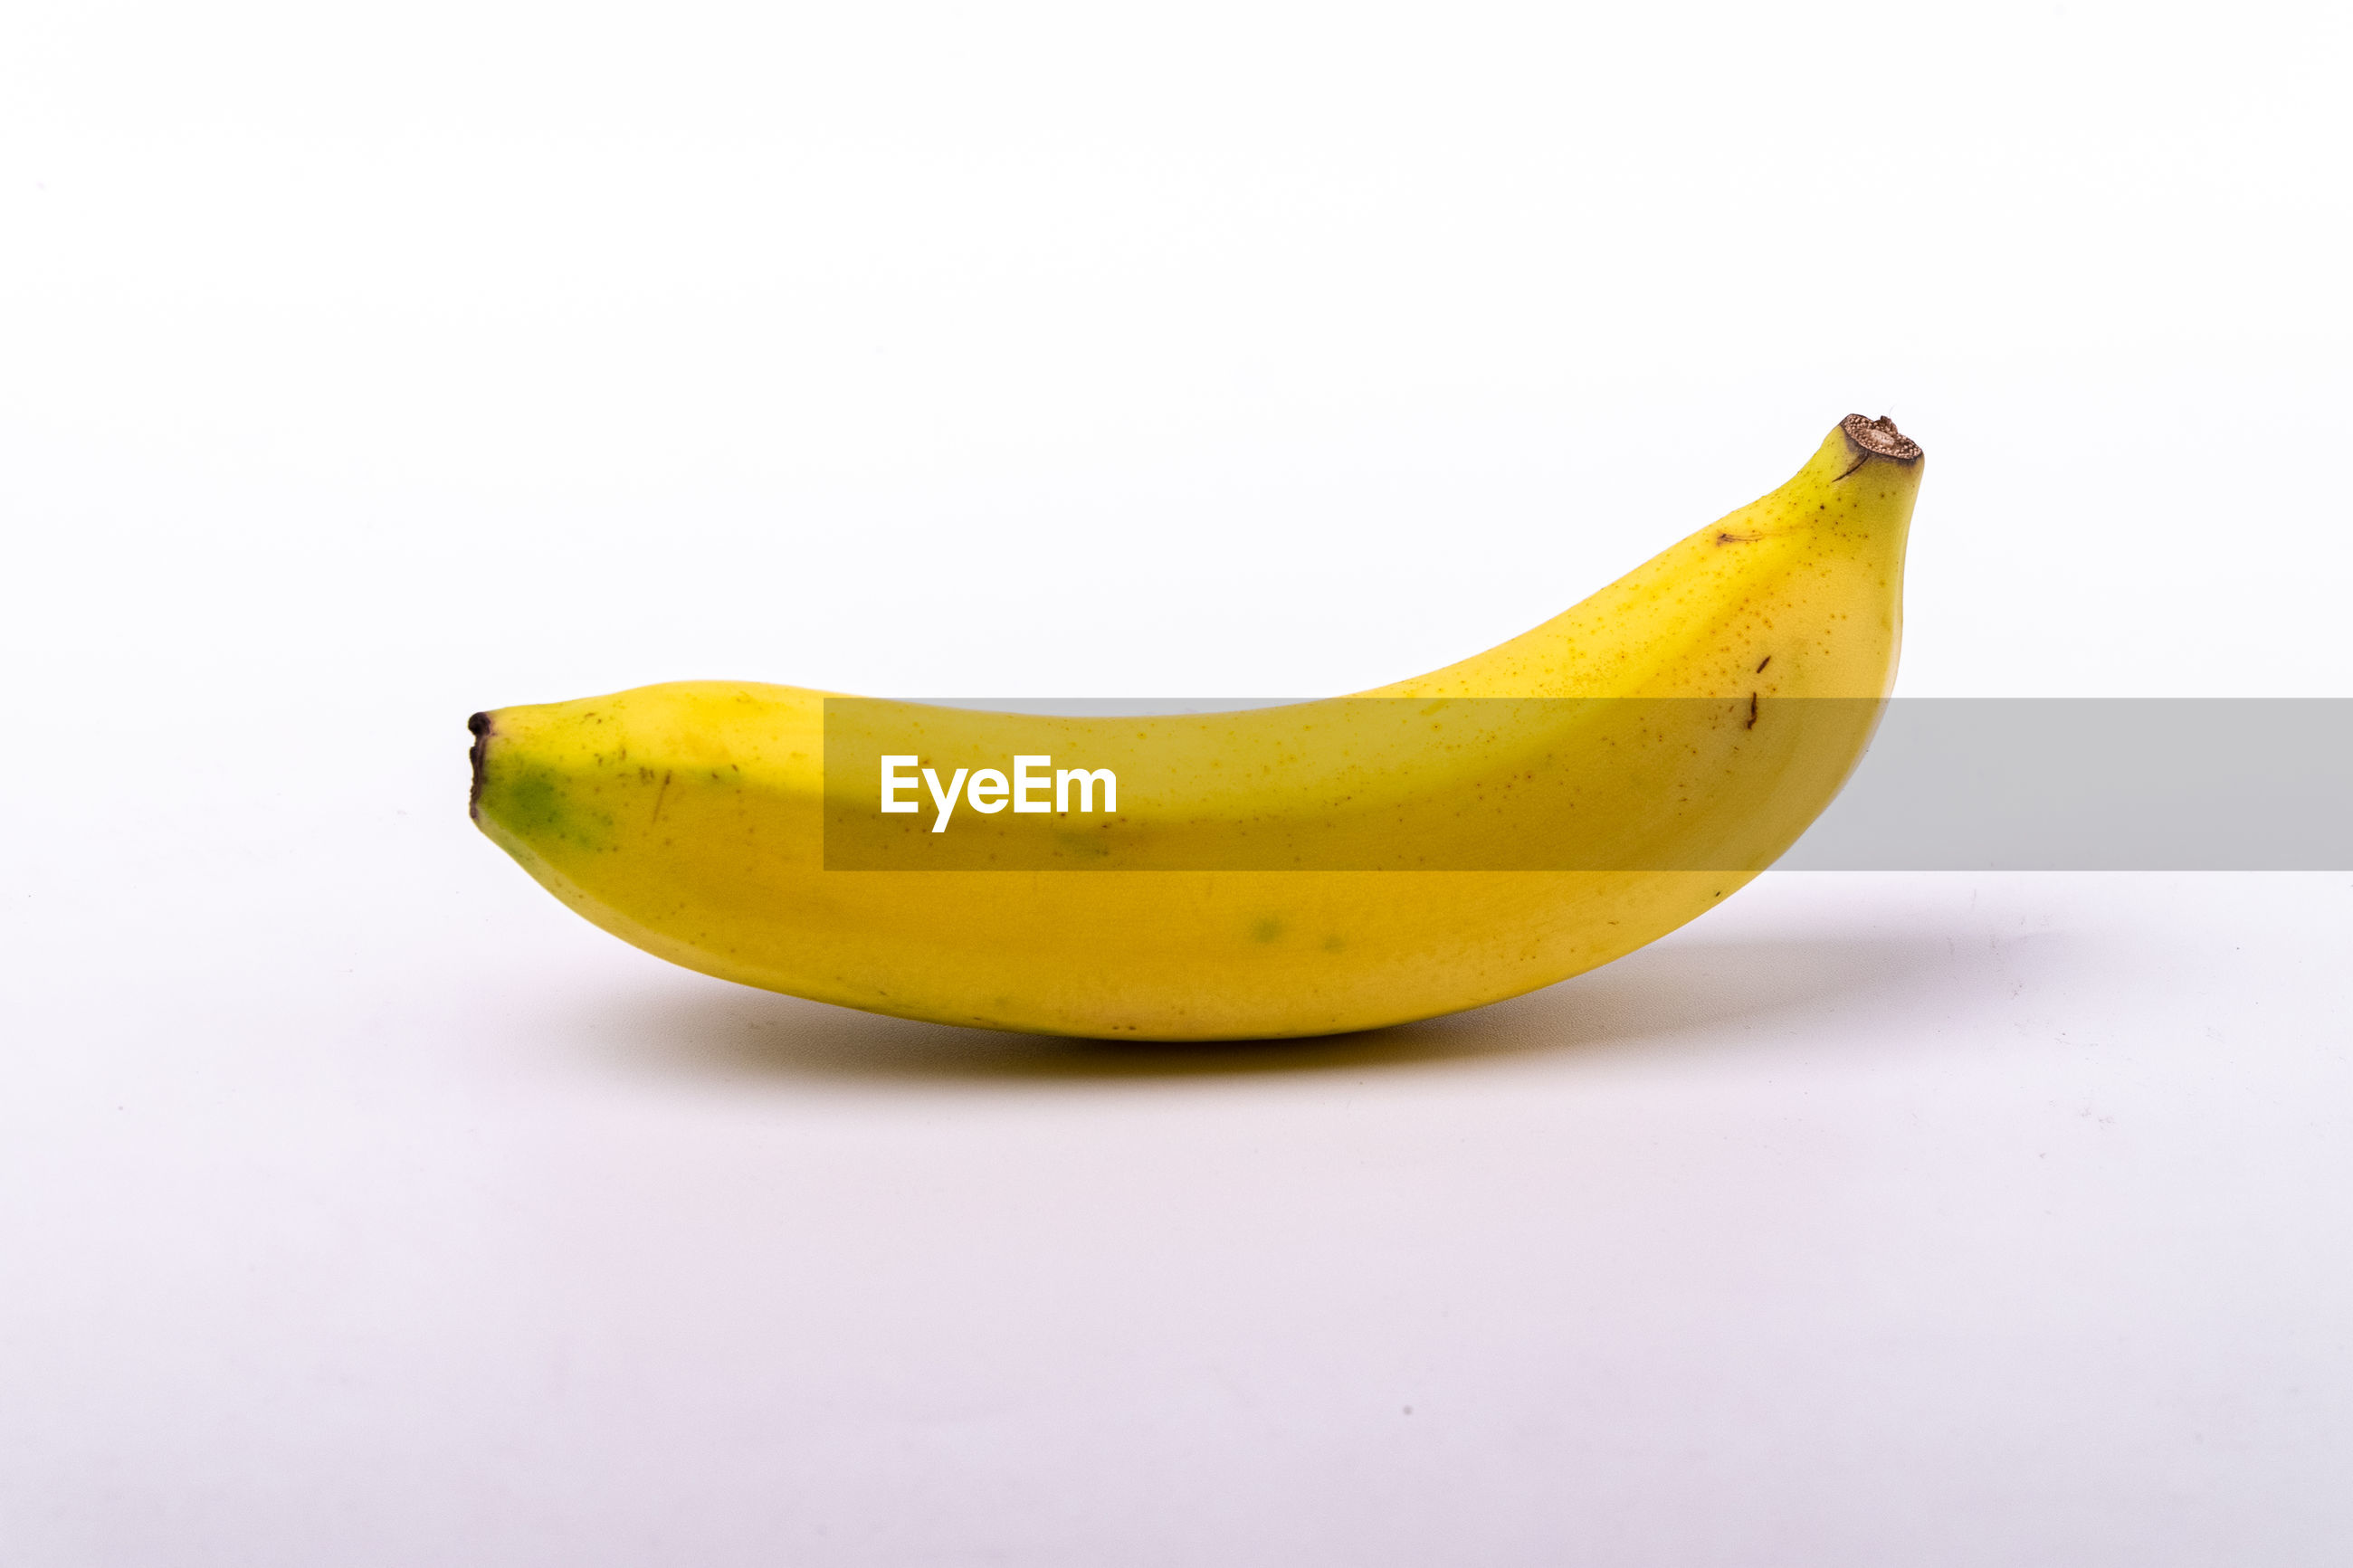 CLOSE-UP OF YELLOW FRUIT